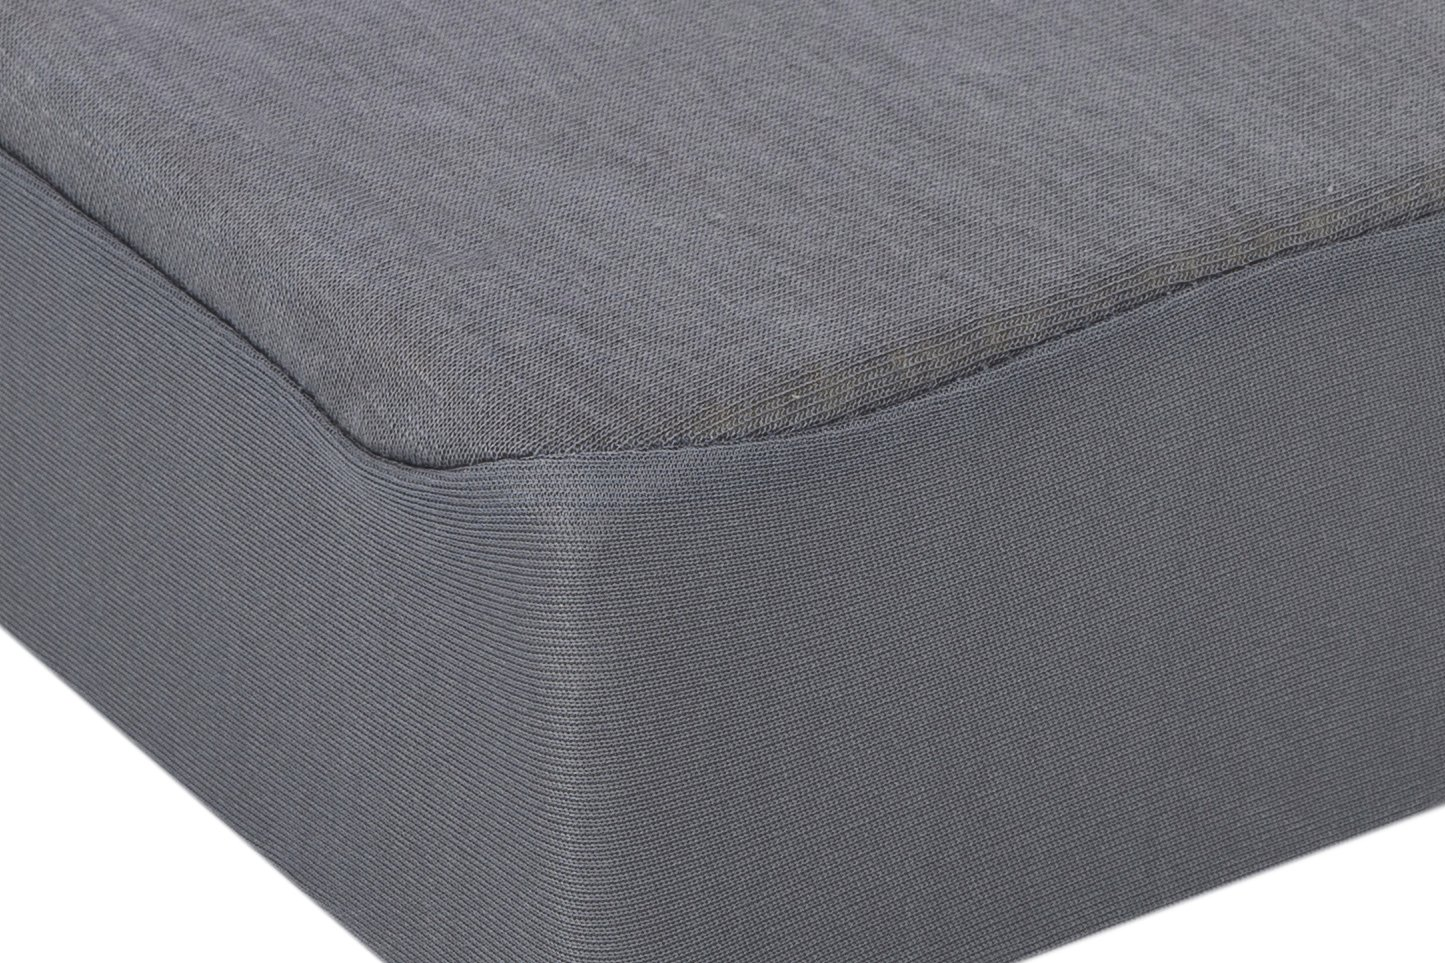 BSensible Tencel Sábana bajera protectora impermeable y transpirable Gris (Antracita) 150 x 190: Amazon.es: Hogar